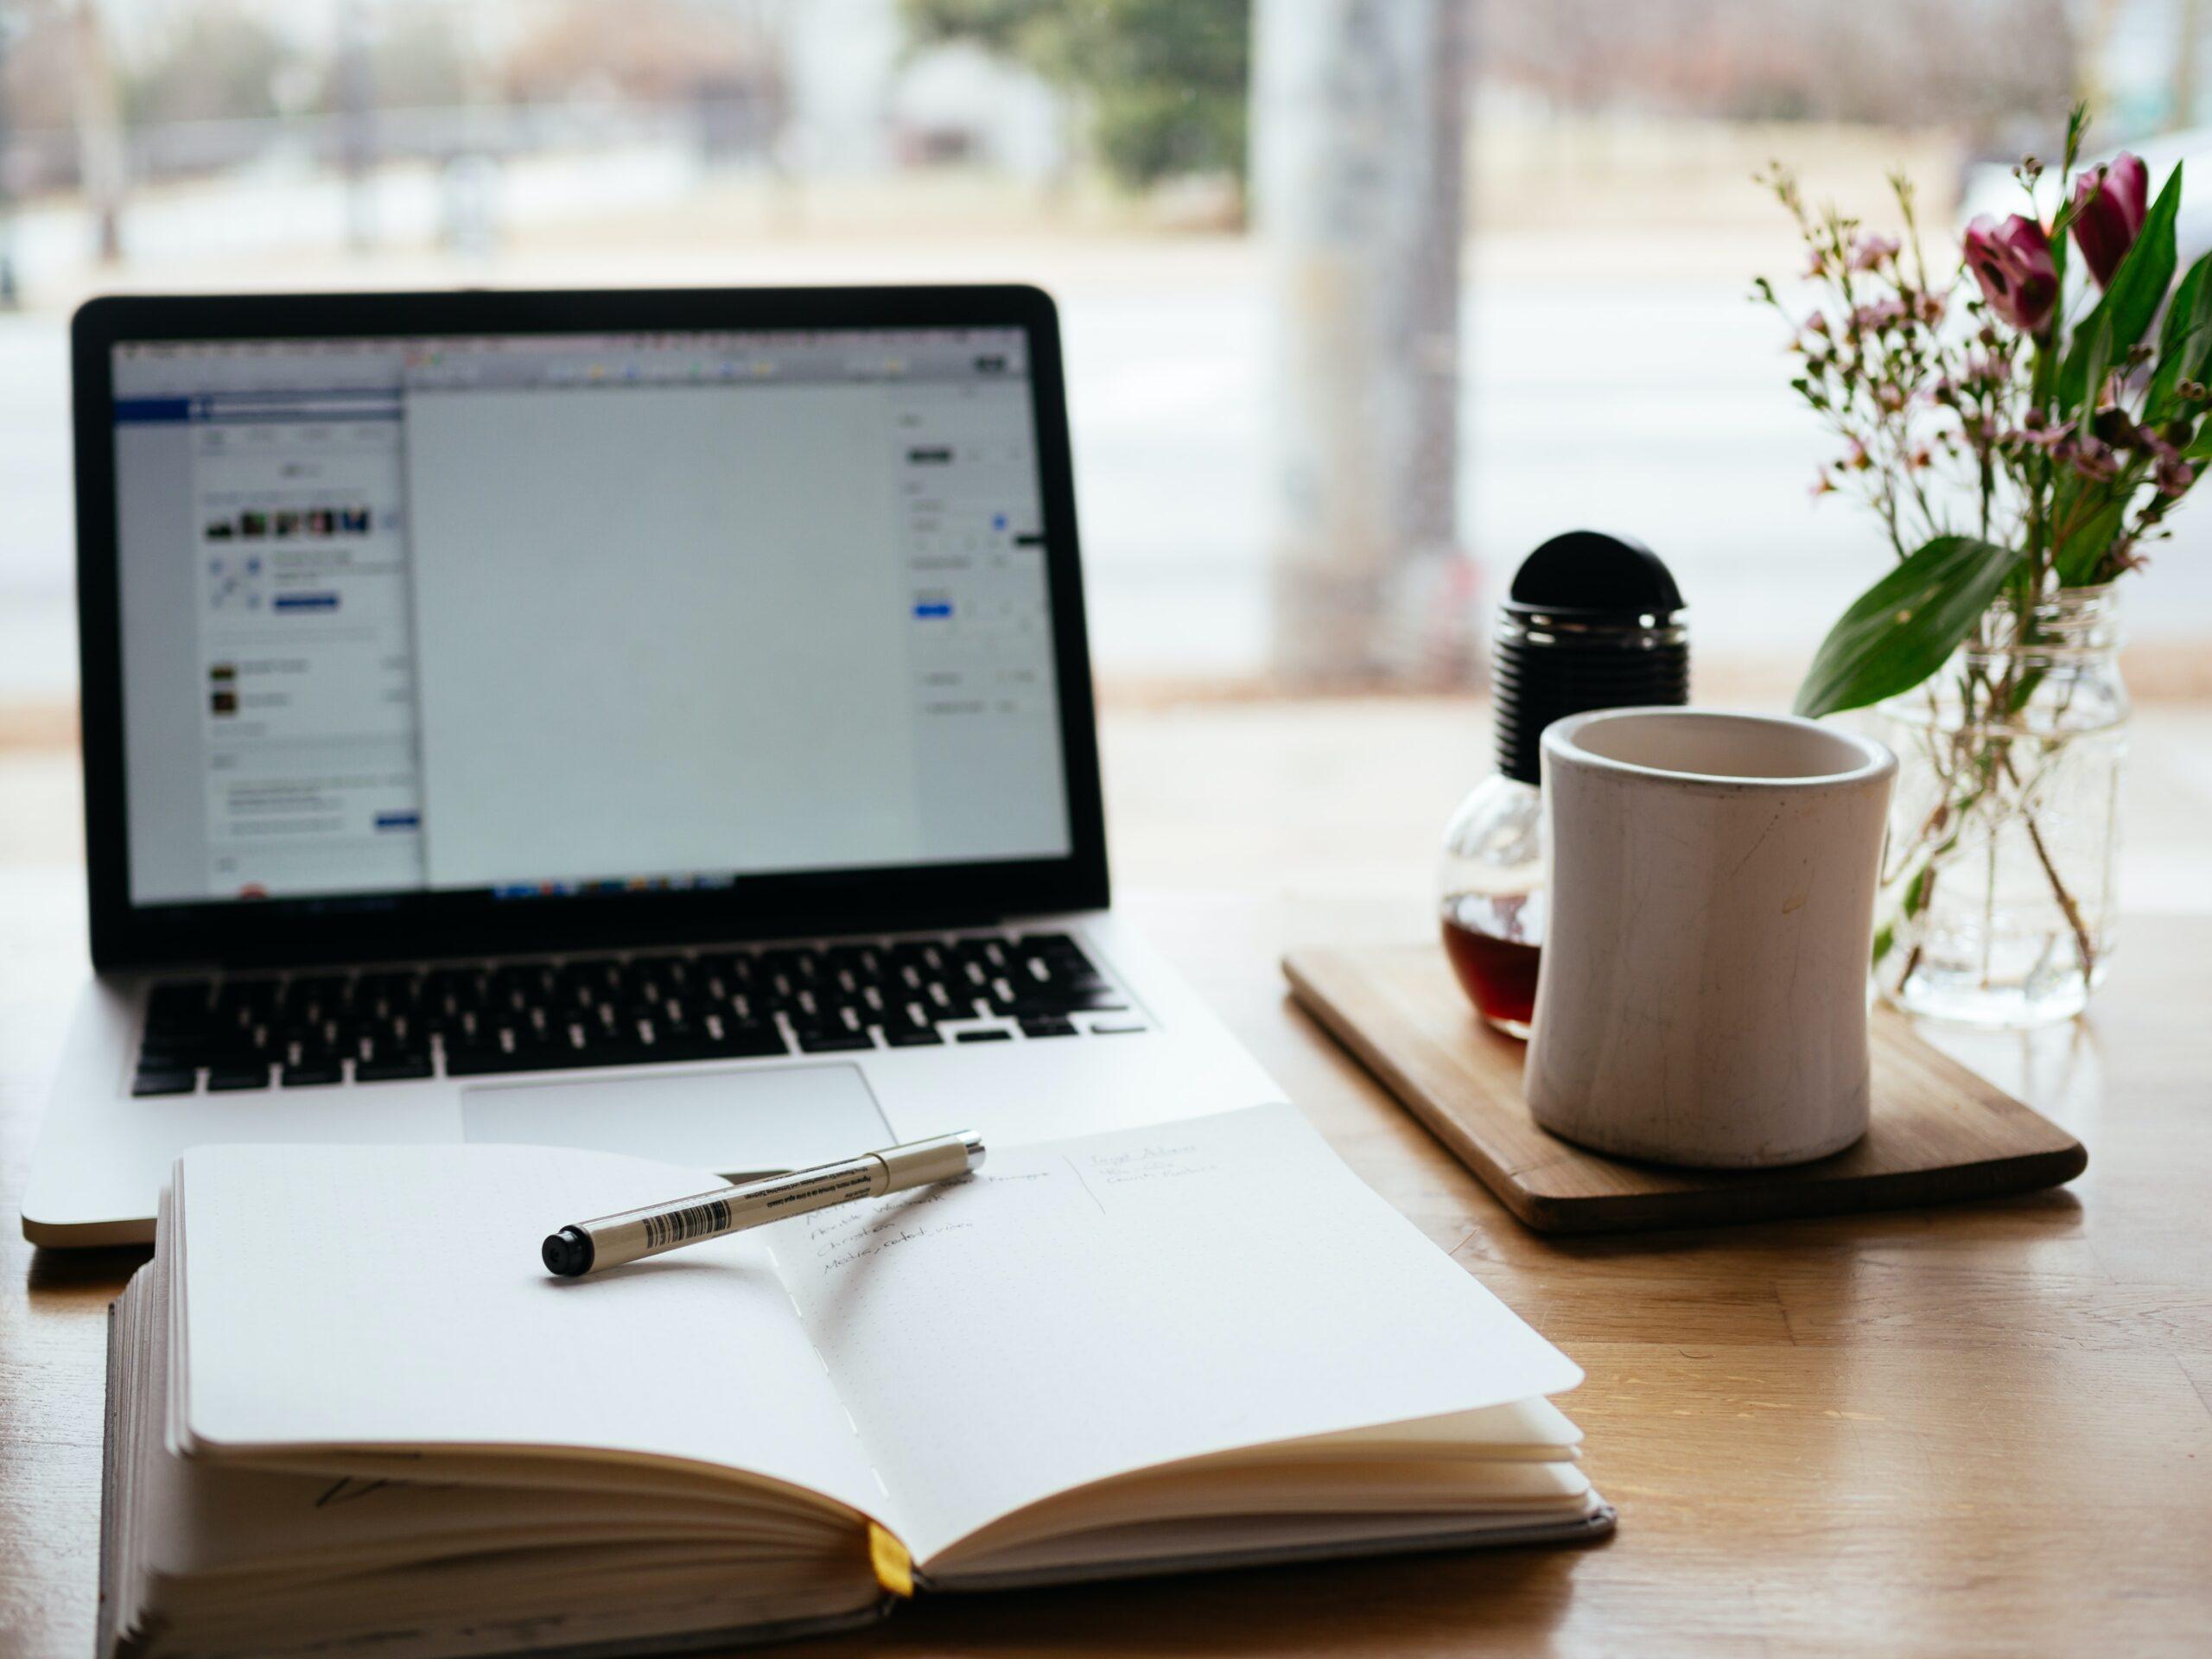 Reanimating the forgotten skill of brainstorming: 4 ways to brainstorm remotely + bonus tips